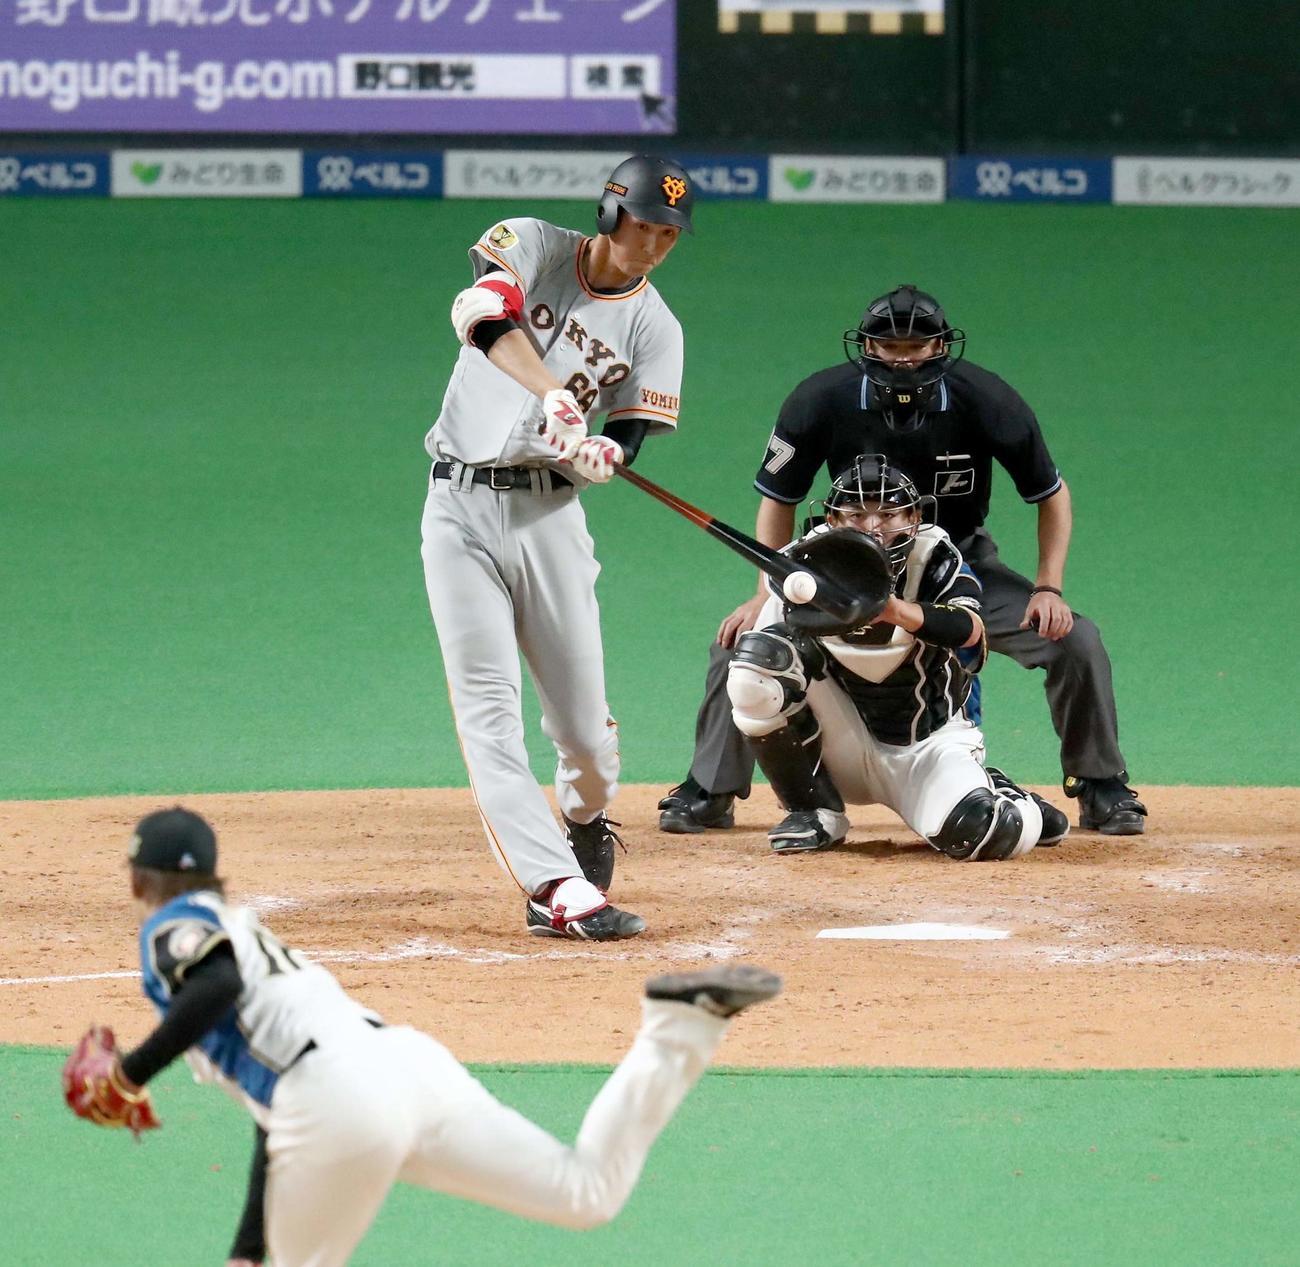 日本ハム対巨人 5回表巨人無死二塁、右前打を放つ秋広(撮影・黒川智章)